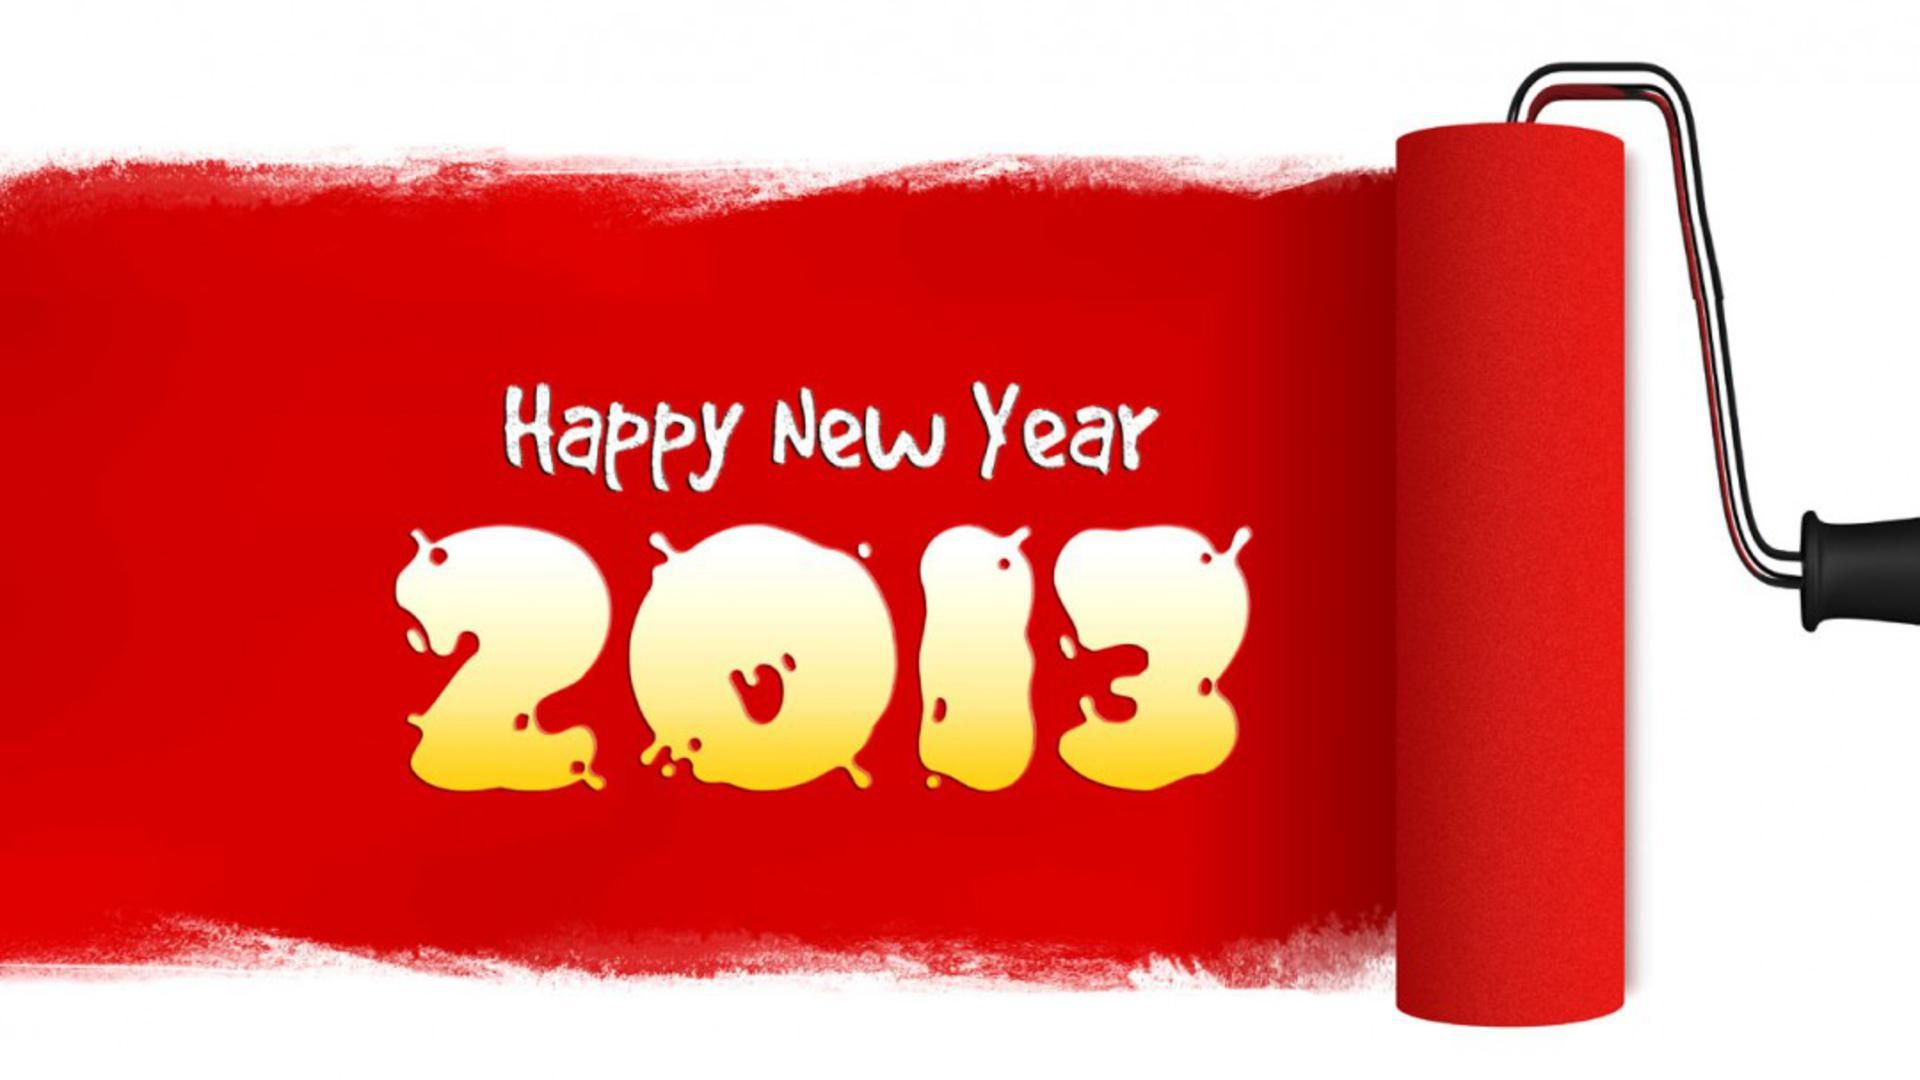 Download Merry Xmas and Happy New Year Xmas Wallpaper HD